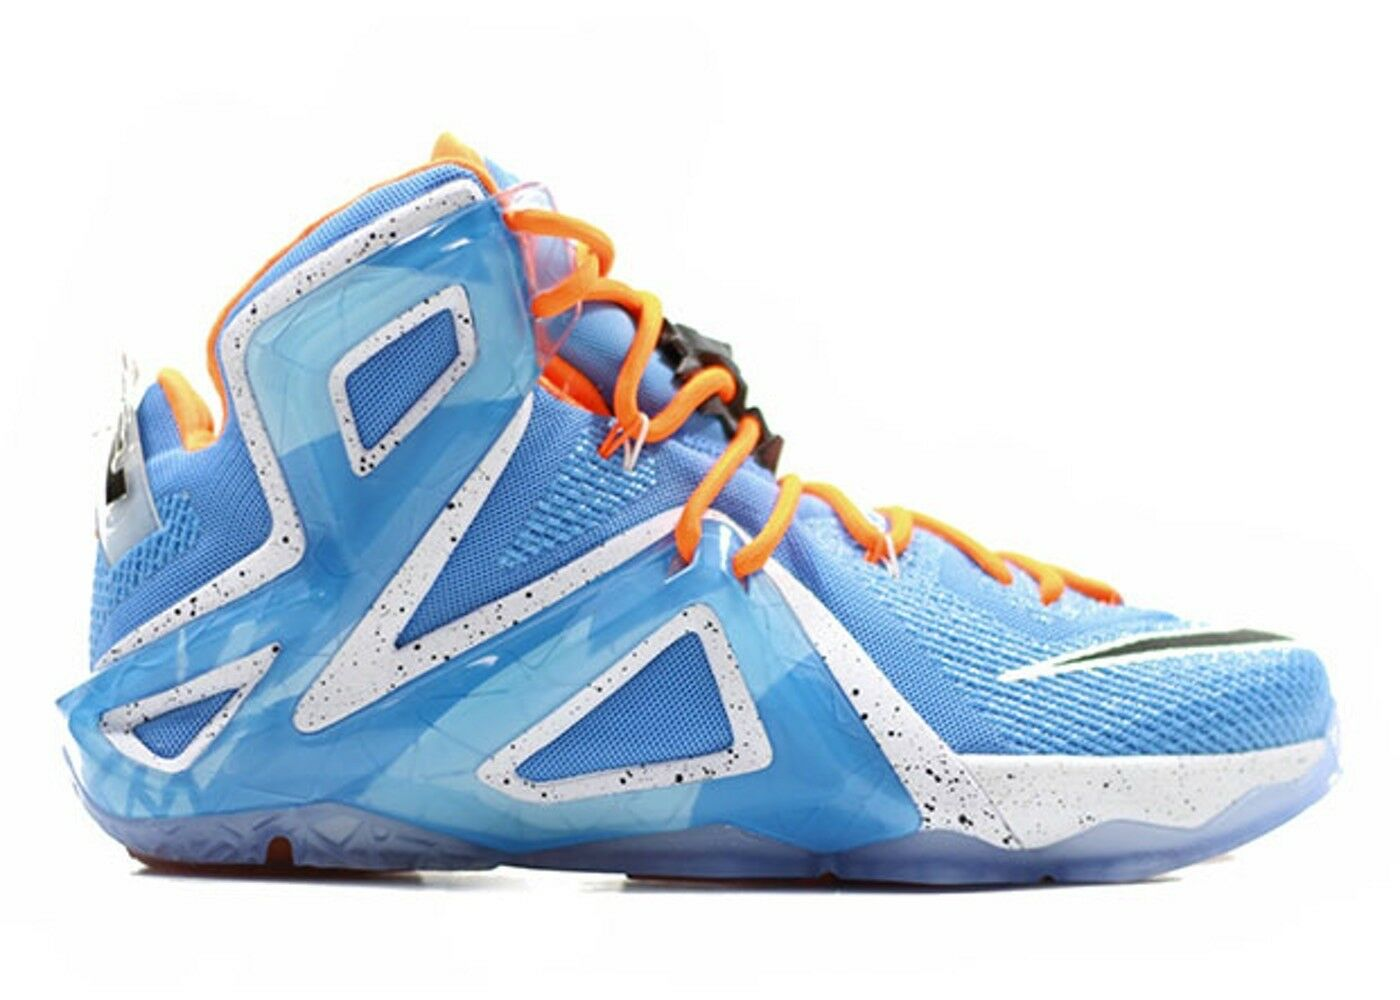 Nike lebron xii 12 uomini elite elevare blu nuova dimensione